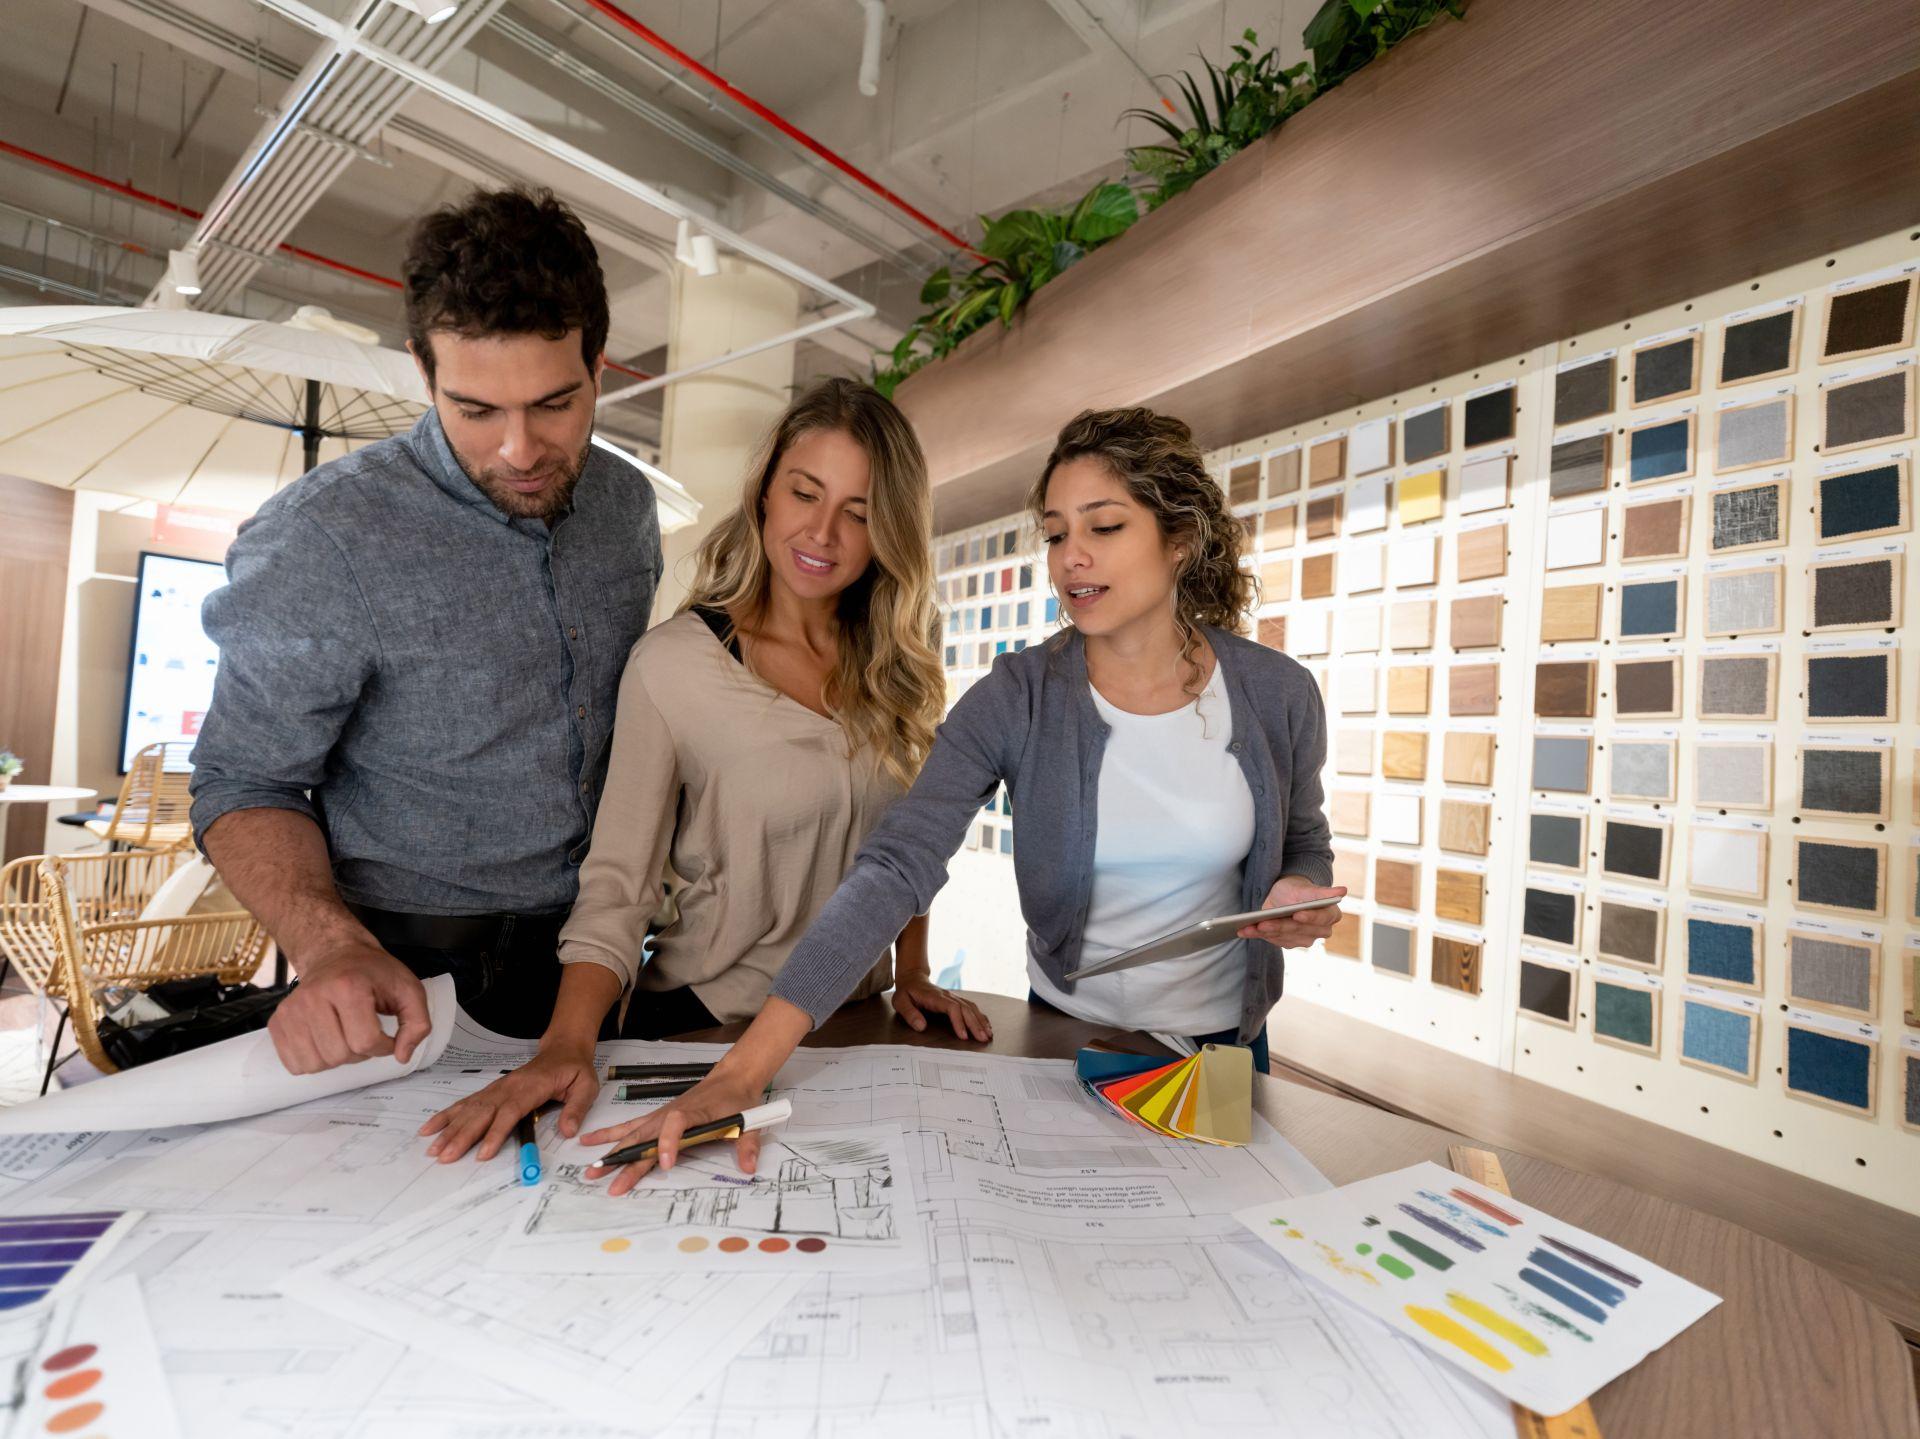 Three people working on an interior design plan